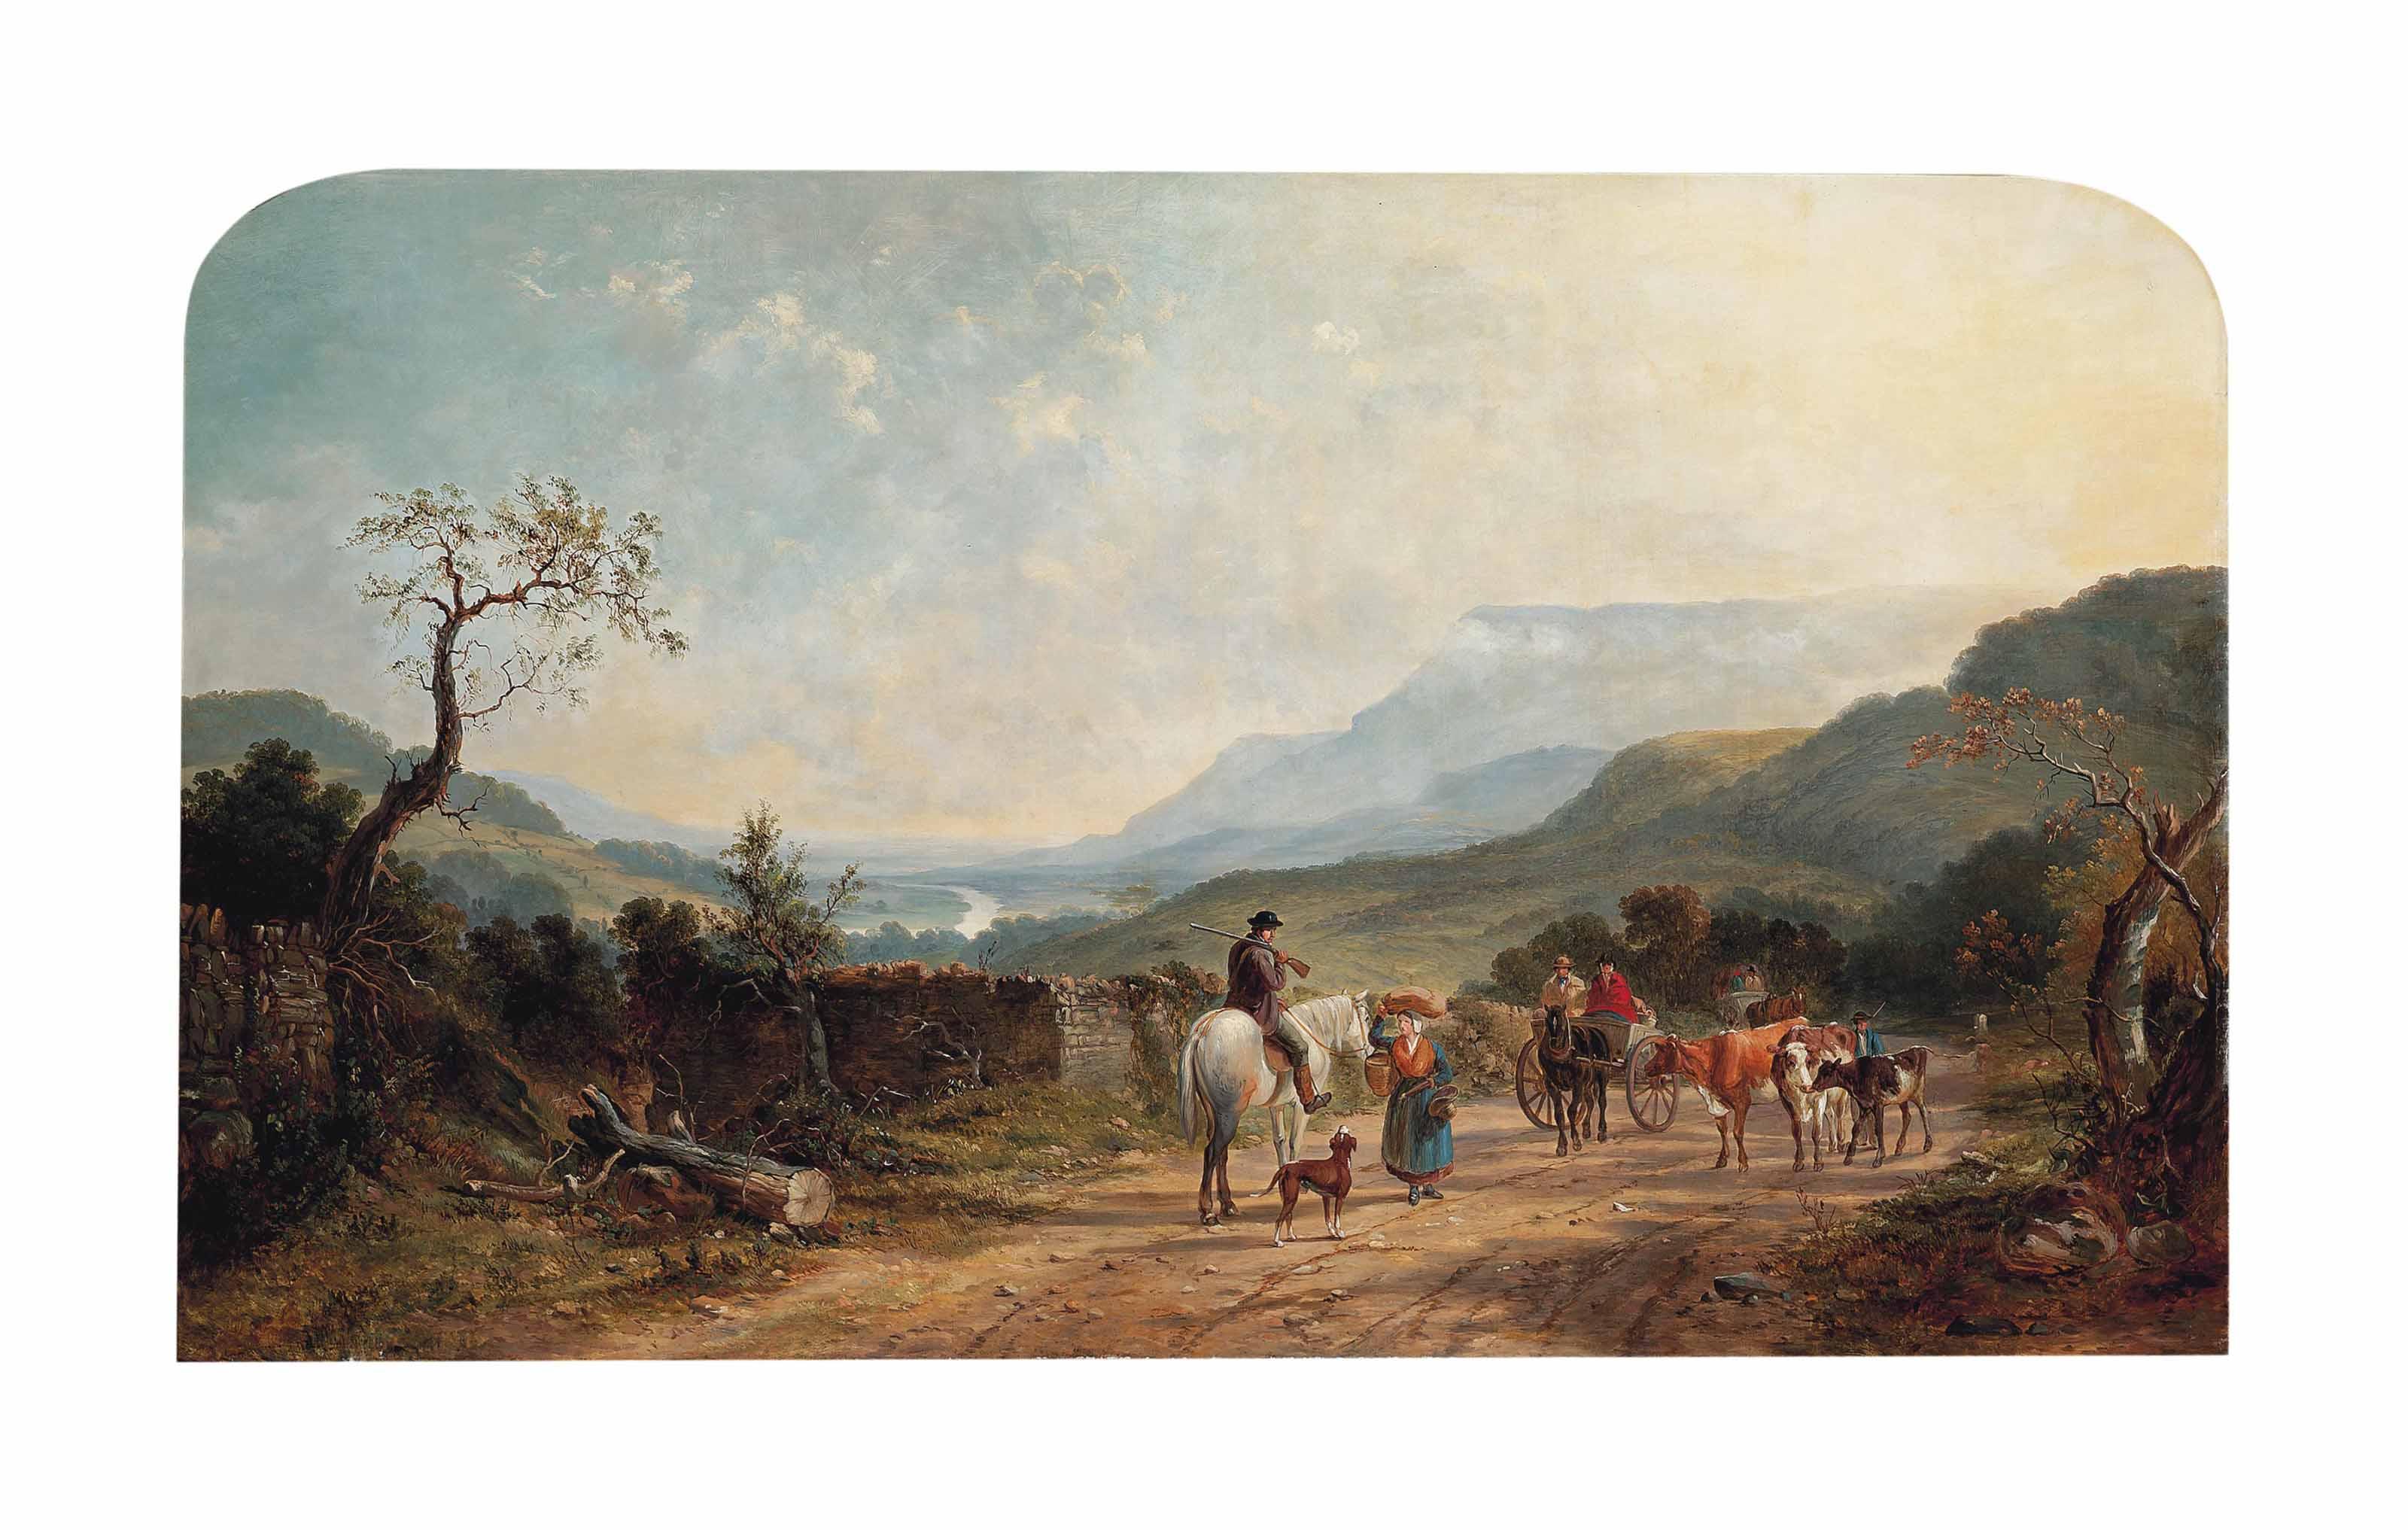 Travellers on a beaten track, an extensive landscape beyond